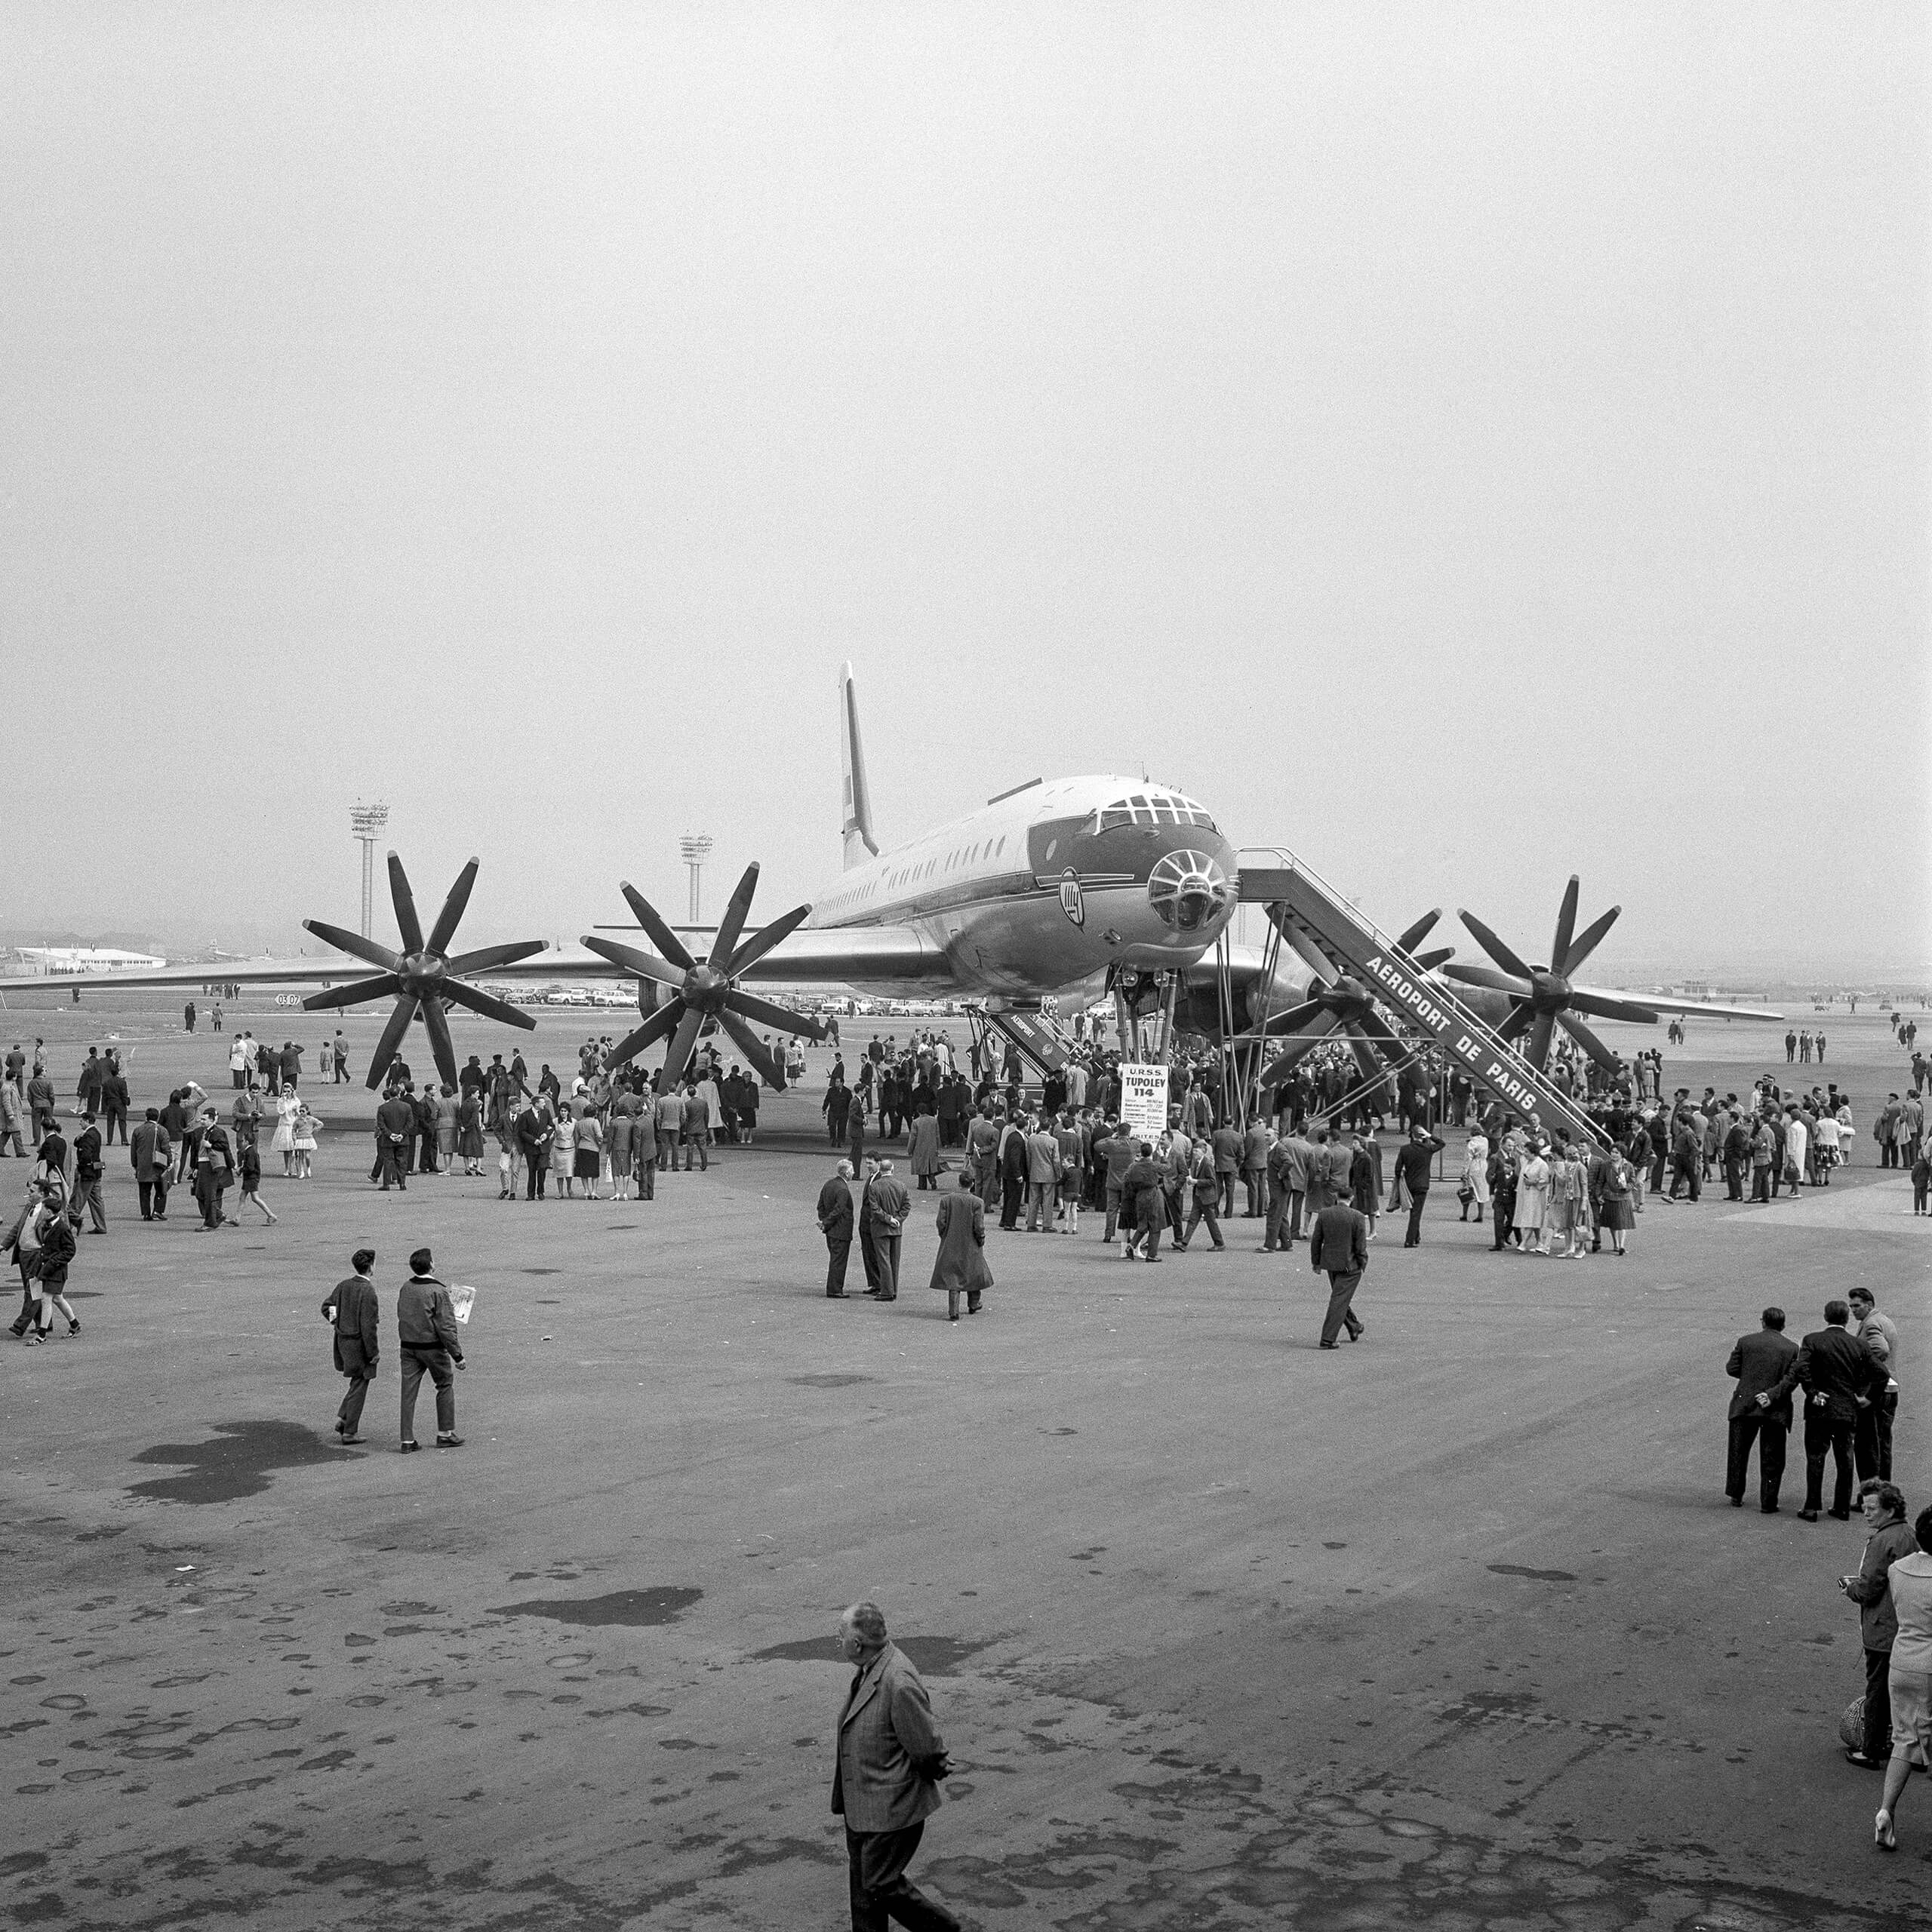 Walter Janach | A Love Affair with Aviation on the 500C